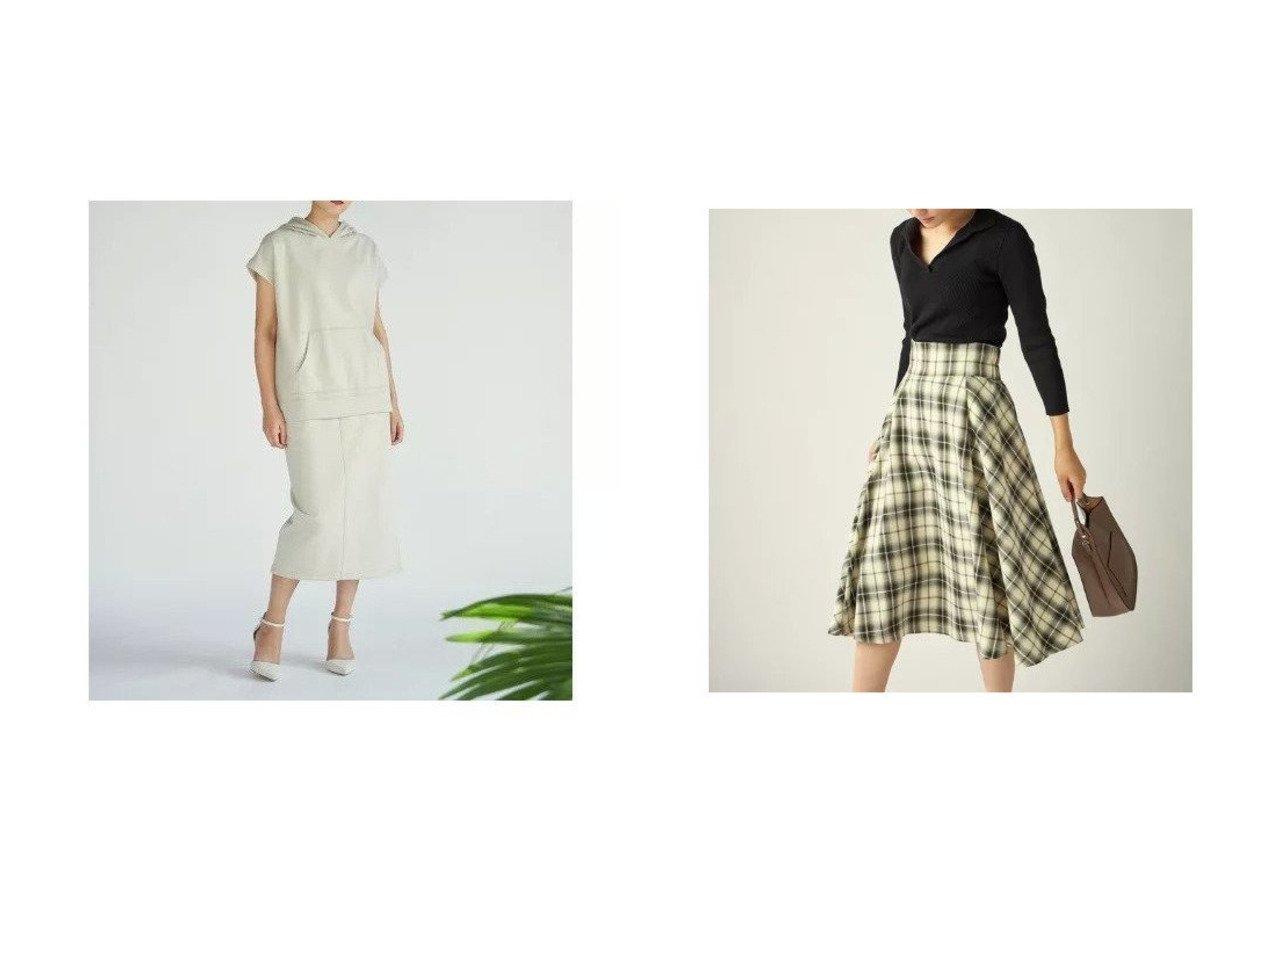 【CLEAR IMPRESSION/クリアインプレッション】の《musee》裏毛タイトスカート&《musee》オーバーペインチェックスカート 【スカート】おすすめ!人気、トレンド・レディースファッションの通販 おすすめで人気の流行・トレンド、ファッションの通販商品 メンズファッション・キッズファッション・インテリア・家具・レディースファッション・服の通販 founy(ファニー) https://founy.com/ ファッション Fashion レディースファッション WOMEN スカート Skirt セットアップ タイトスカート フロント ポケット リラックス チェック |ID:crp329100000031413